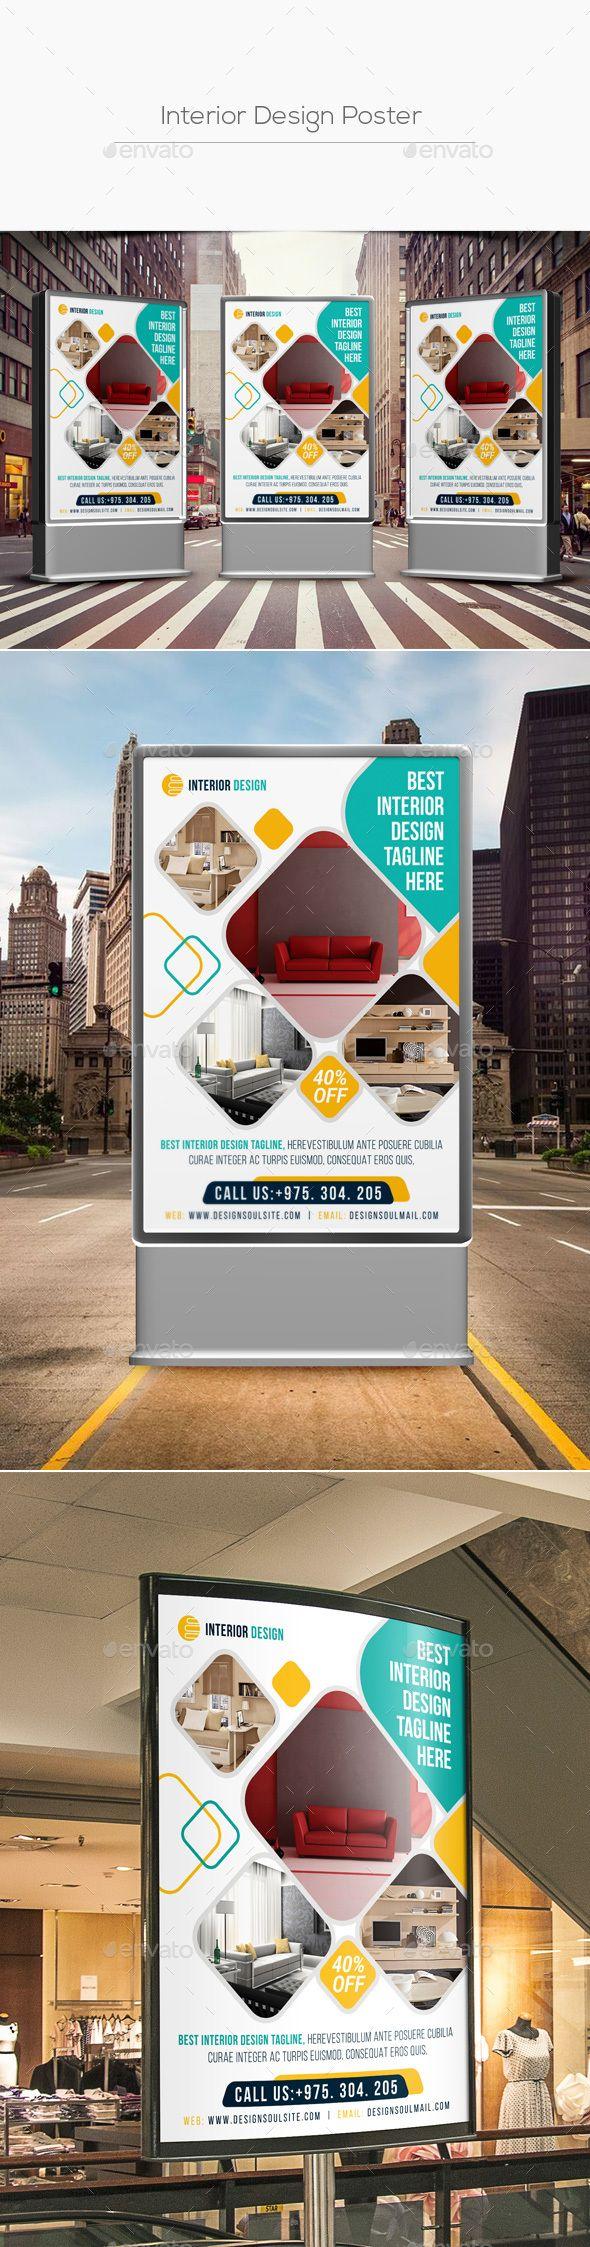 Design Poster Templates - Interior design poster template